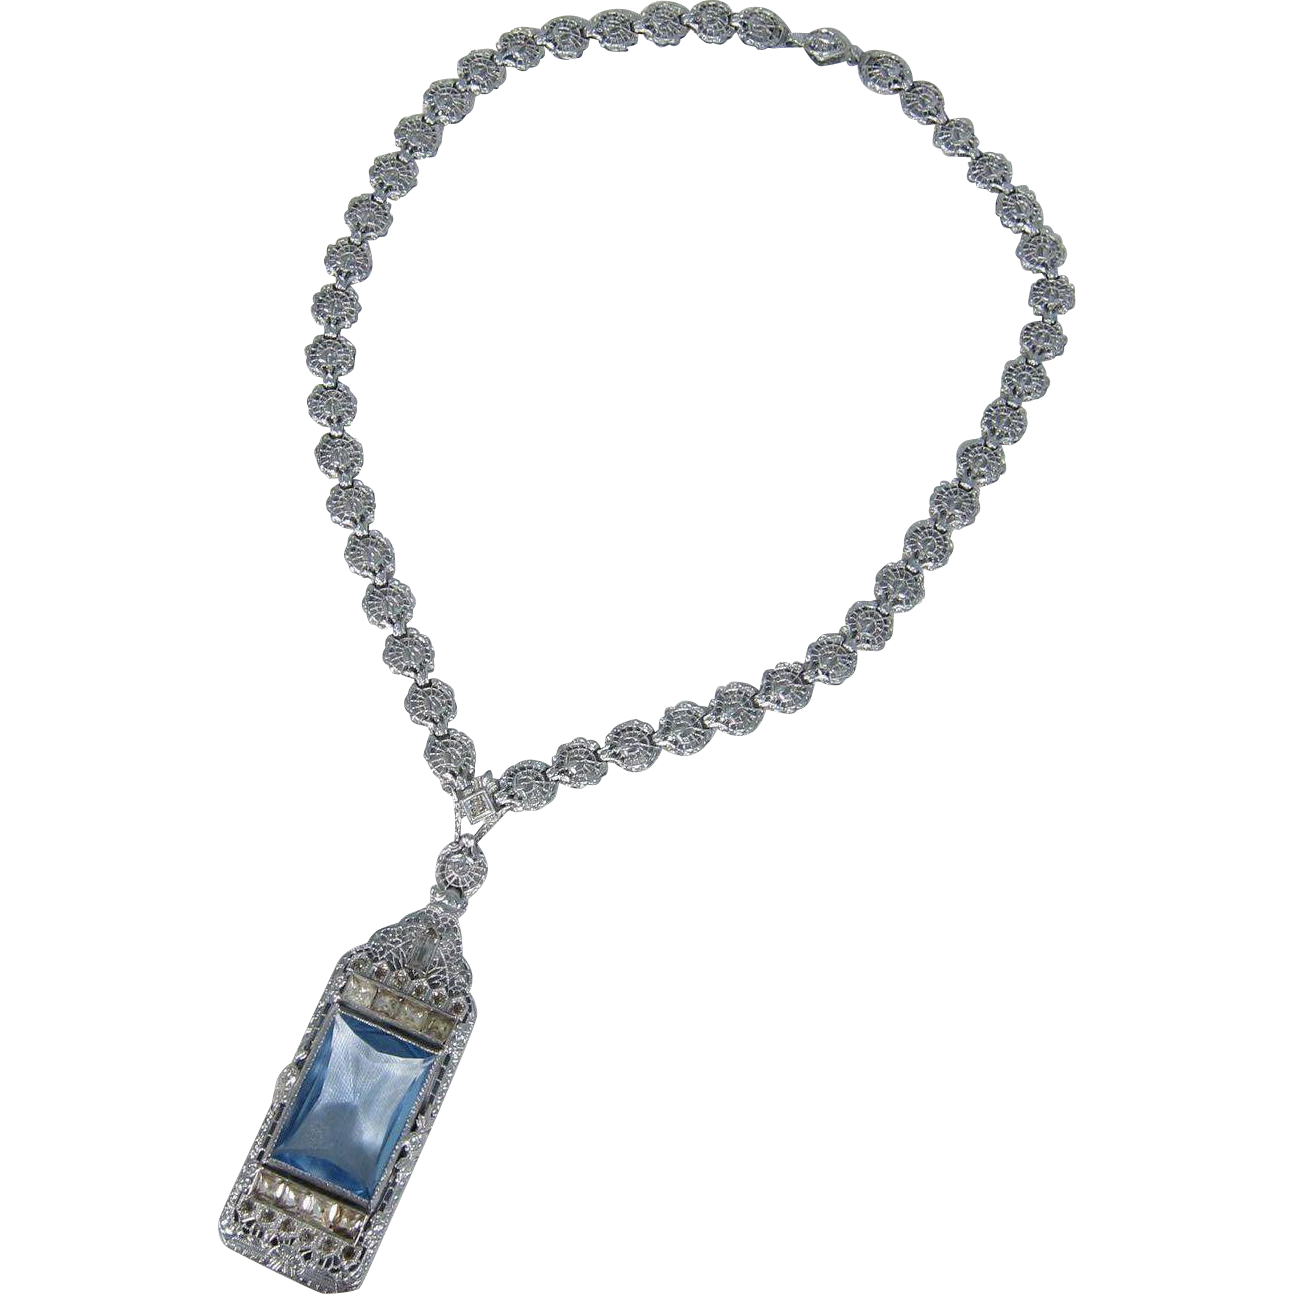 Beautiful Art Deco Rhodium Necklace w/ Blue Aquamarine Glass Large Pendant 1920s